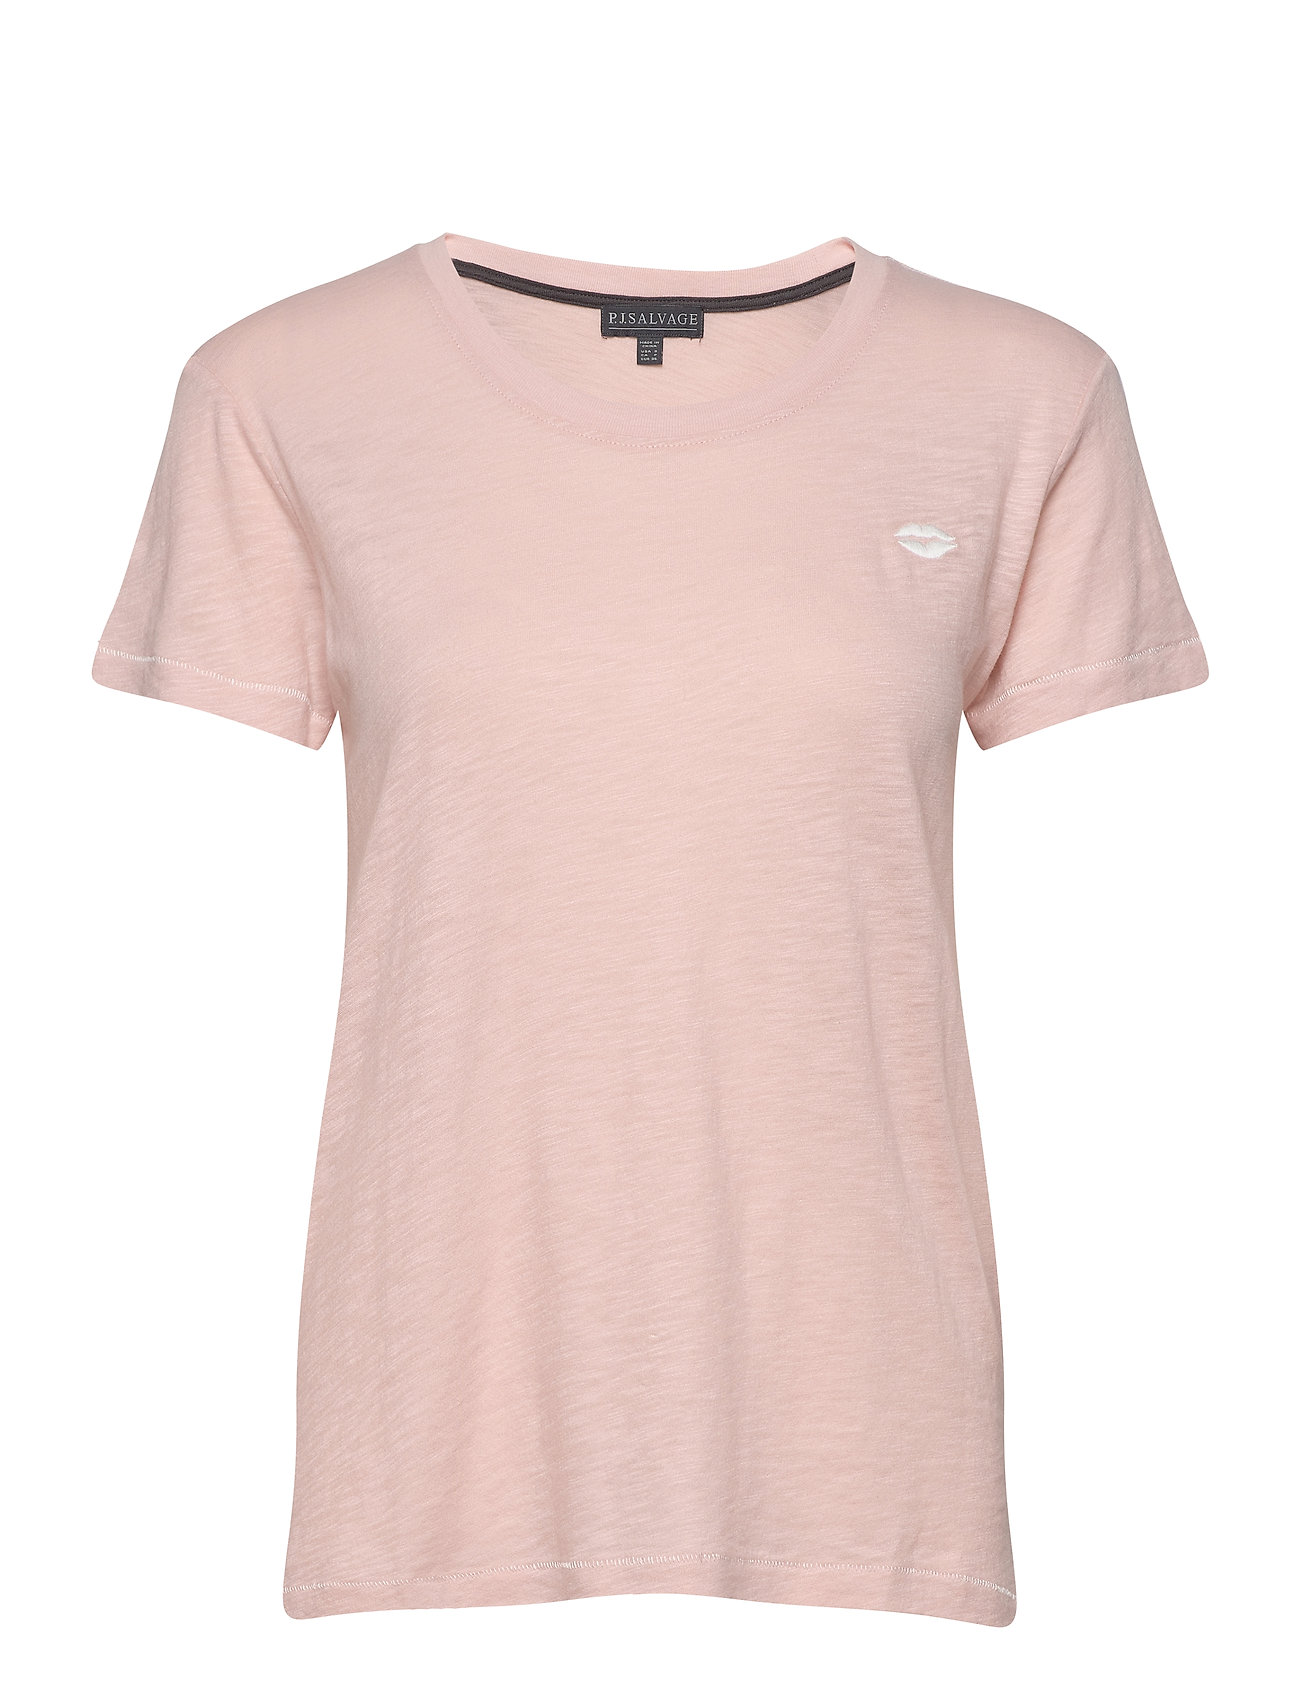 Image of S/S T-Shirt Top Lyserød PJ Salvage (3432608047)